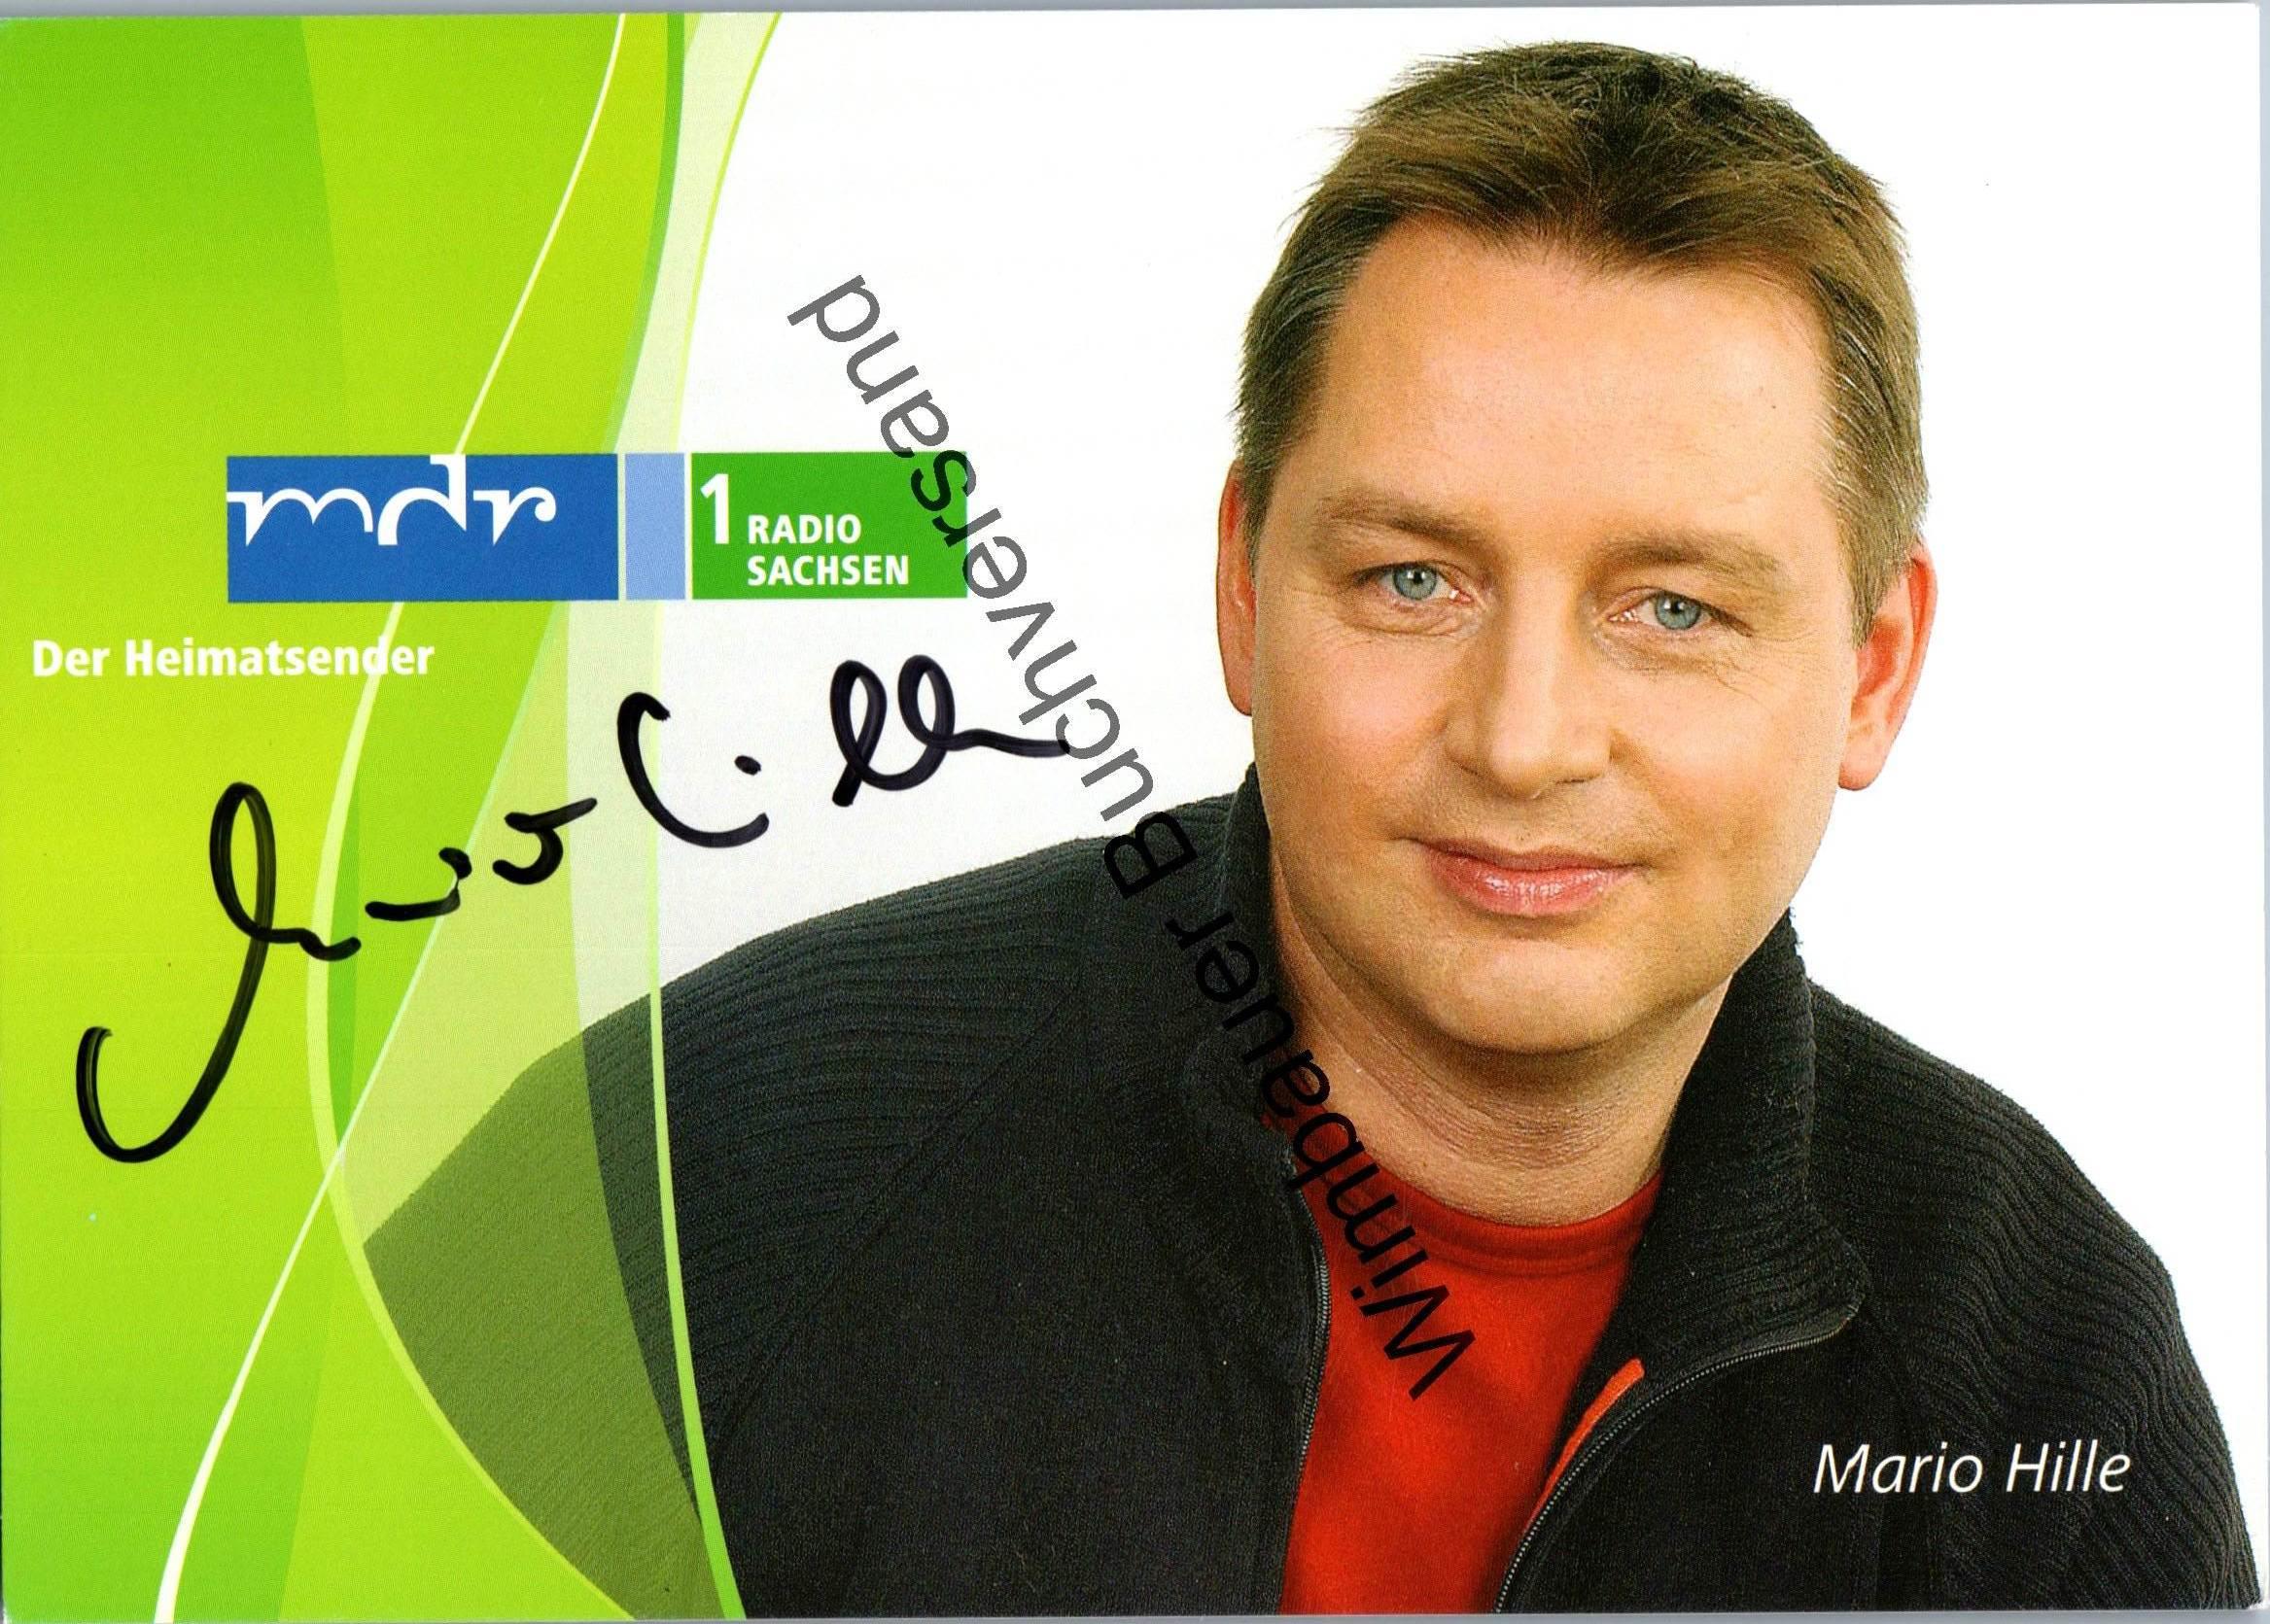 Original Autogramm Mario Hille MDR /// Autogramm Autograph signiert signed signee